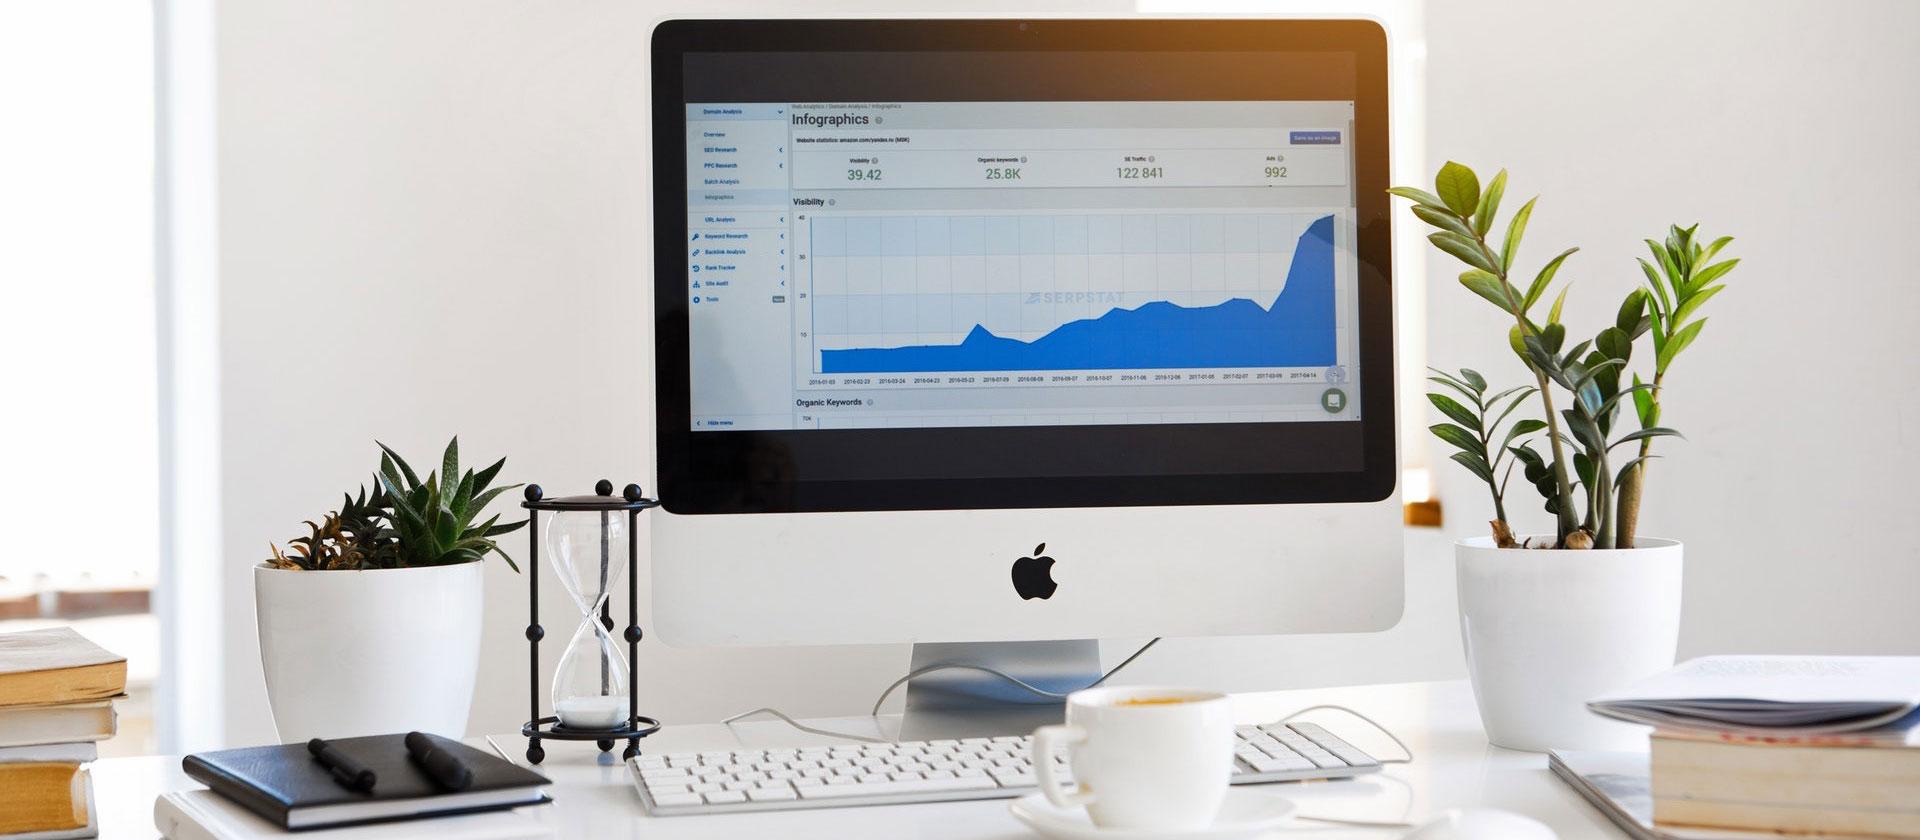 Mac computer on a desk